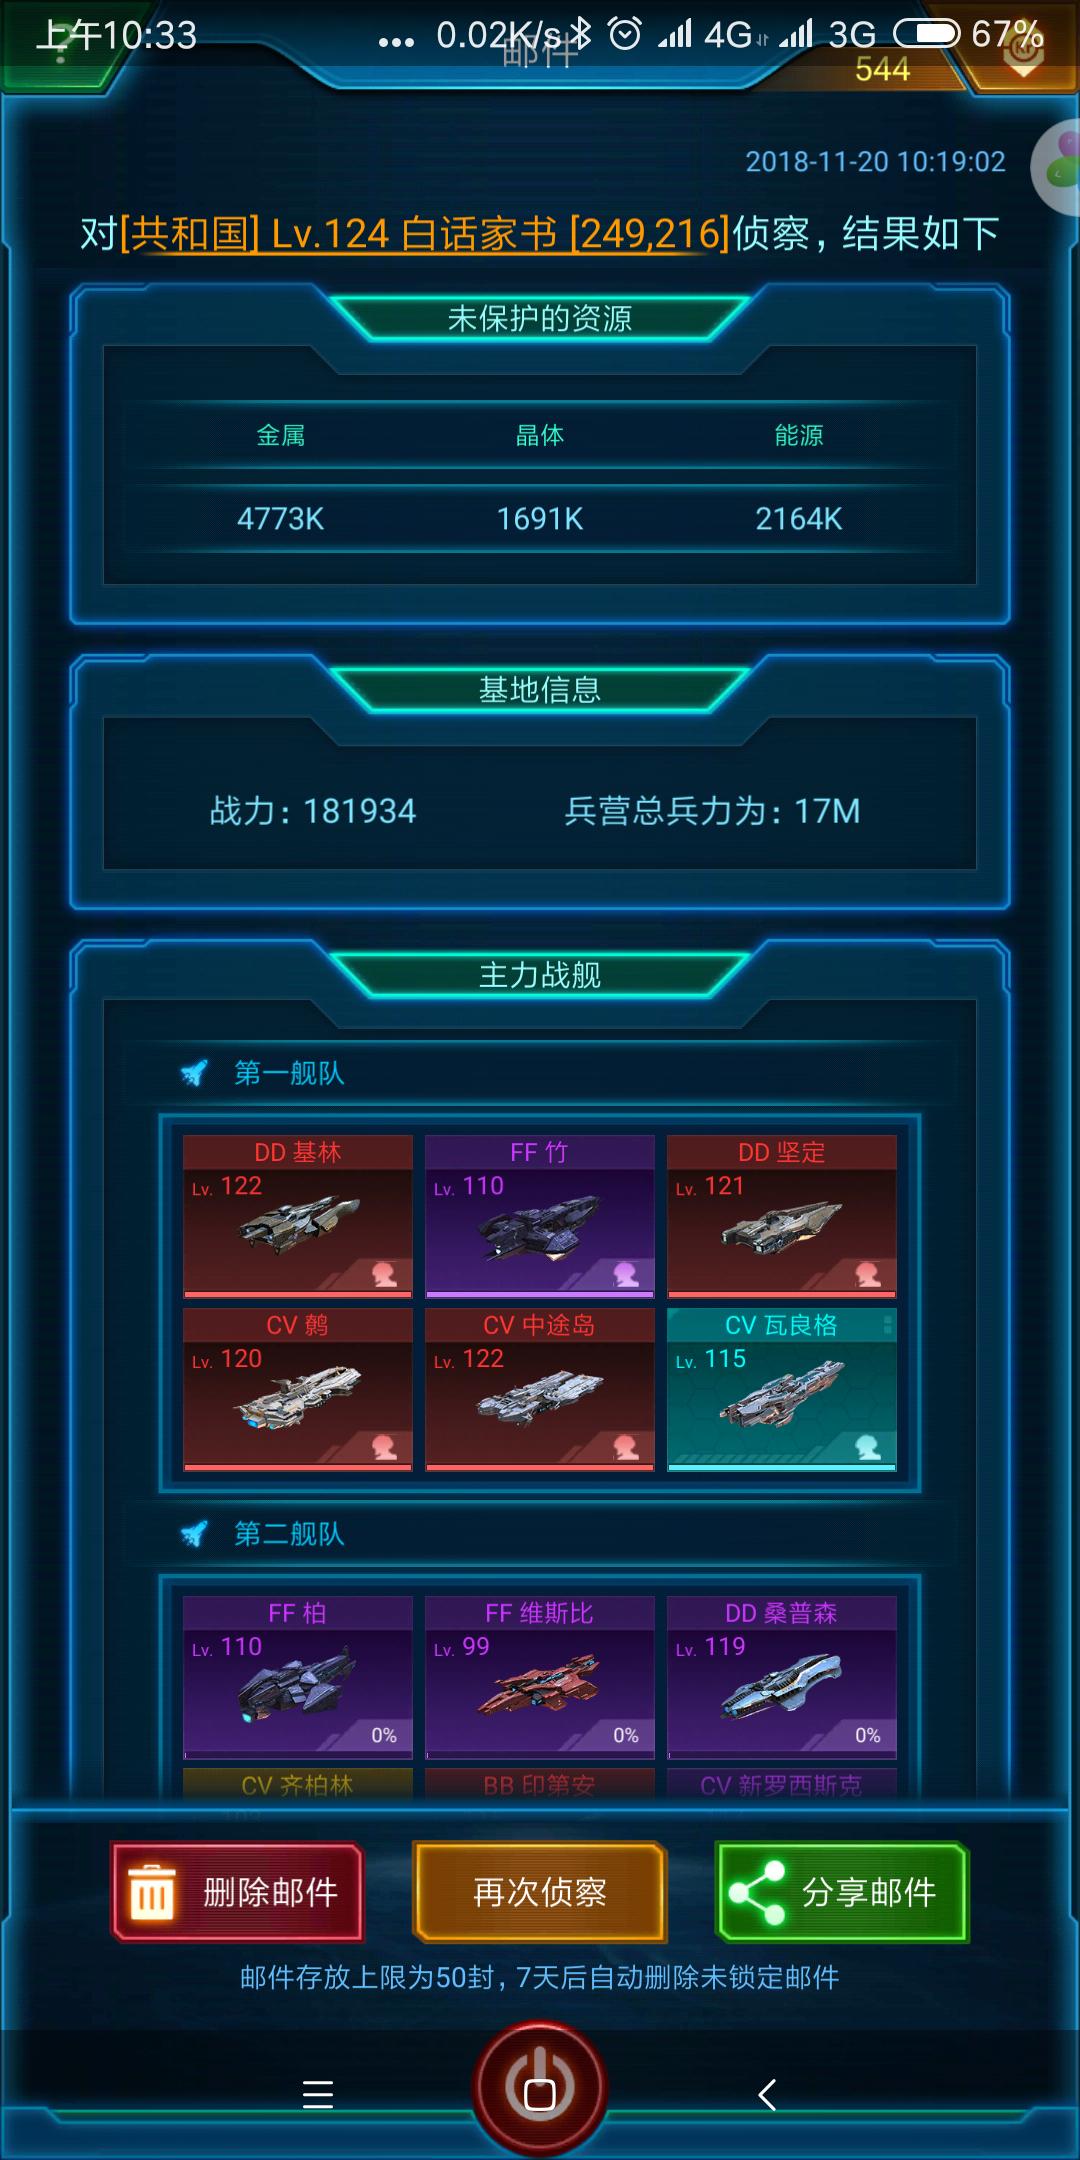 Screenshot_2018-11-20-10-33-04-820_com.jedigames.p16s.huawei.png